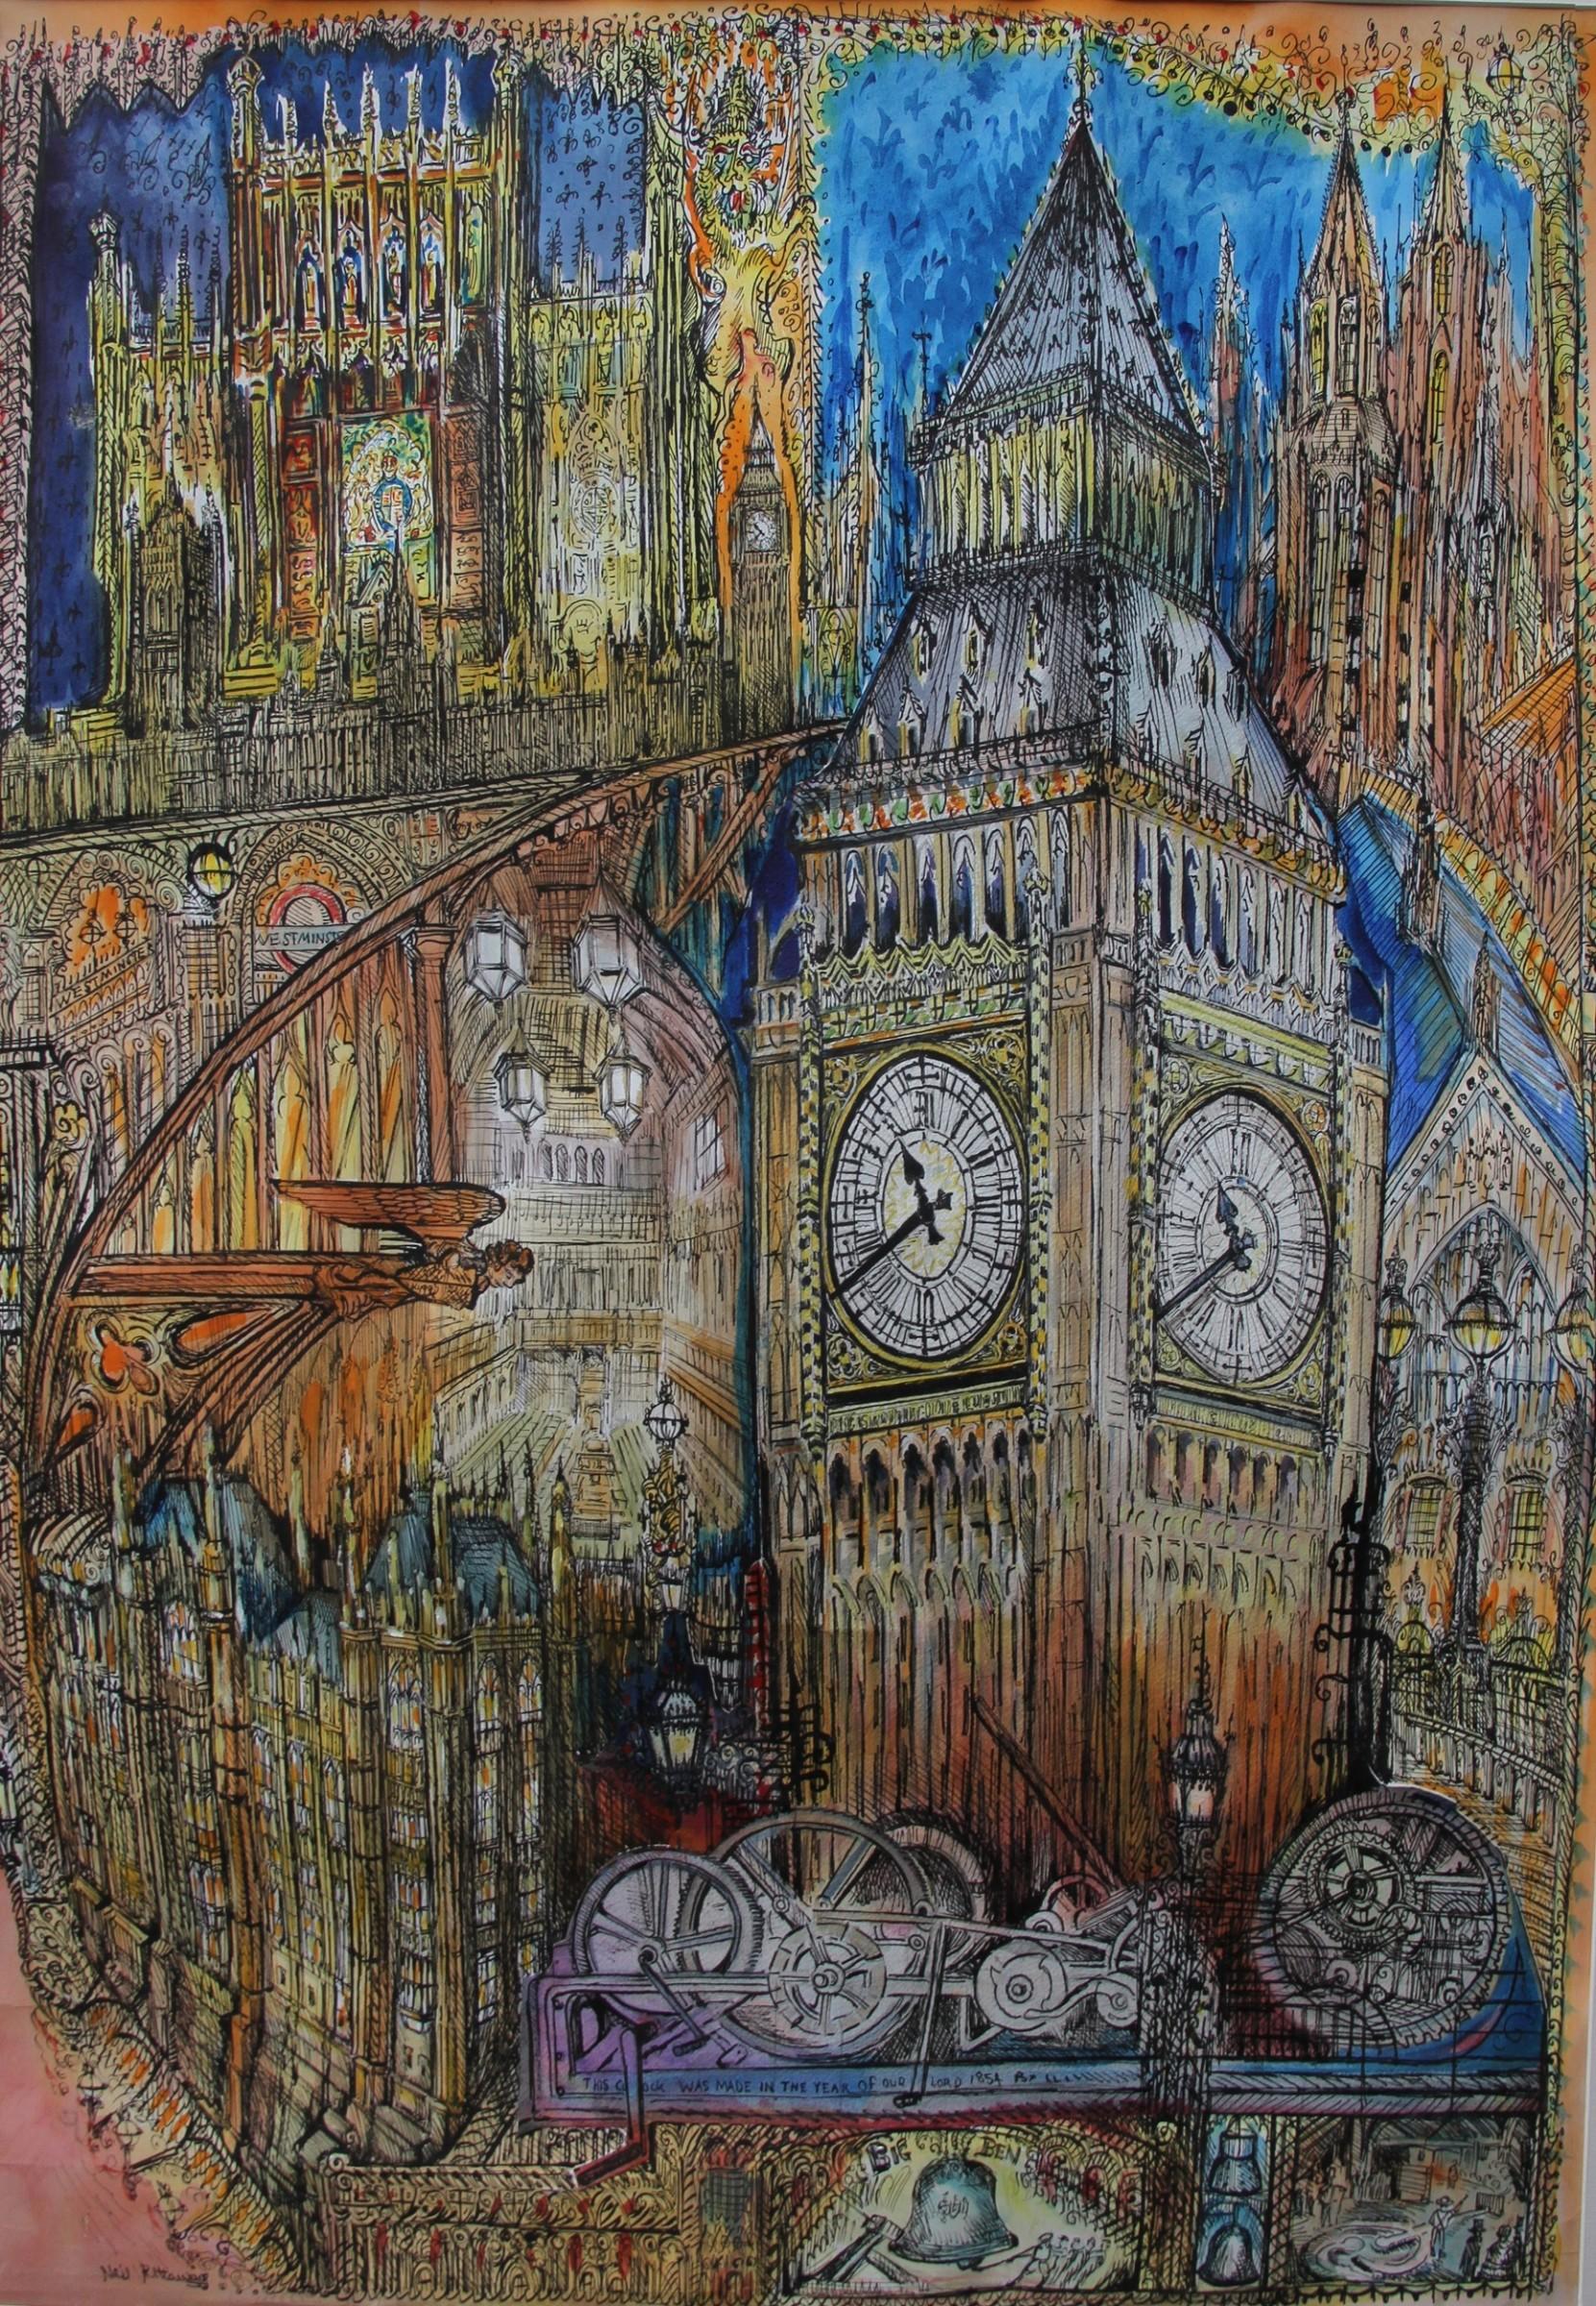 <span class=&#34;link fancybox-details-link&#34;><a href=&#34;/exhibitions/24/works/artworks_standalone10777/&#34;>View Detail Page</a></span><div class=&#34;artist&#34;><span class=&#34;artist&#34;><strong>Neil Pittaway</strong></span></div><div class=&#34;title&#34;><em>The Jewel of Westminster</em></div><div class=&#34;medium&#34;>watercolour, pen & ink</div><div class=&#34;dimensions&#34;>117x86cm</div>